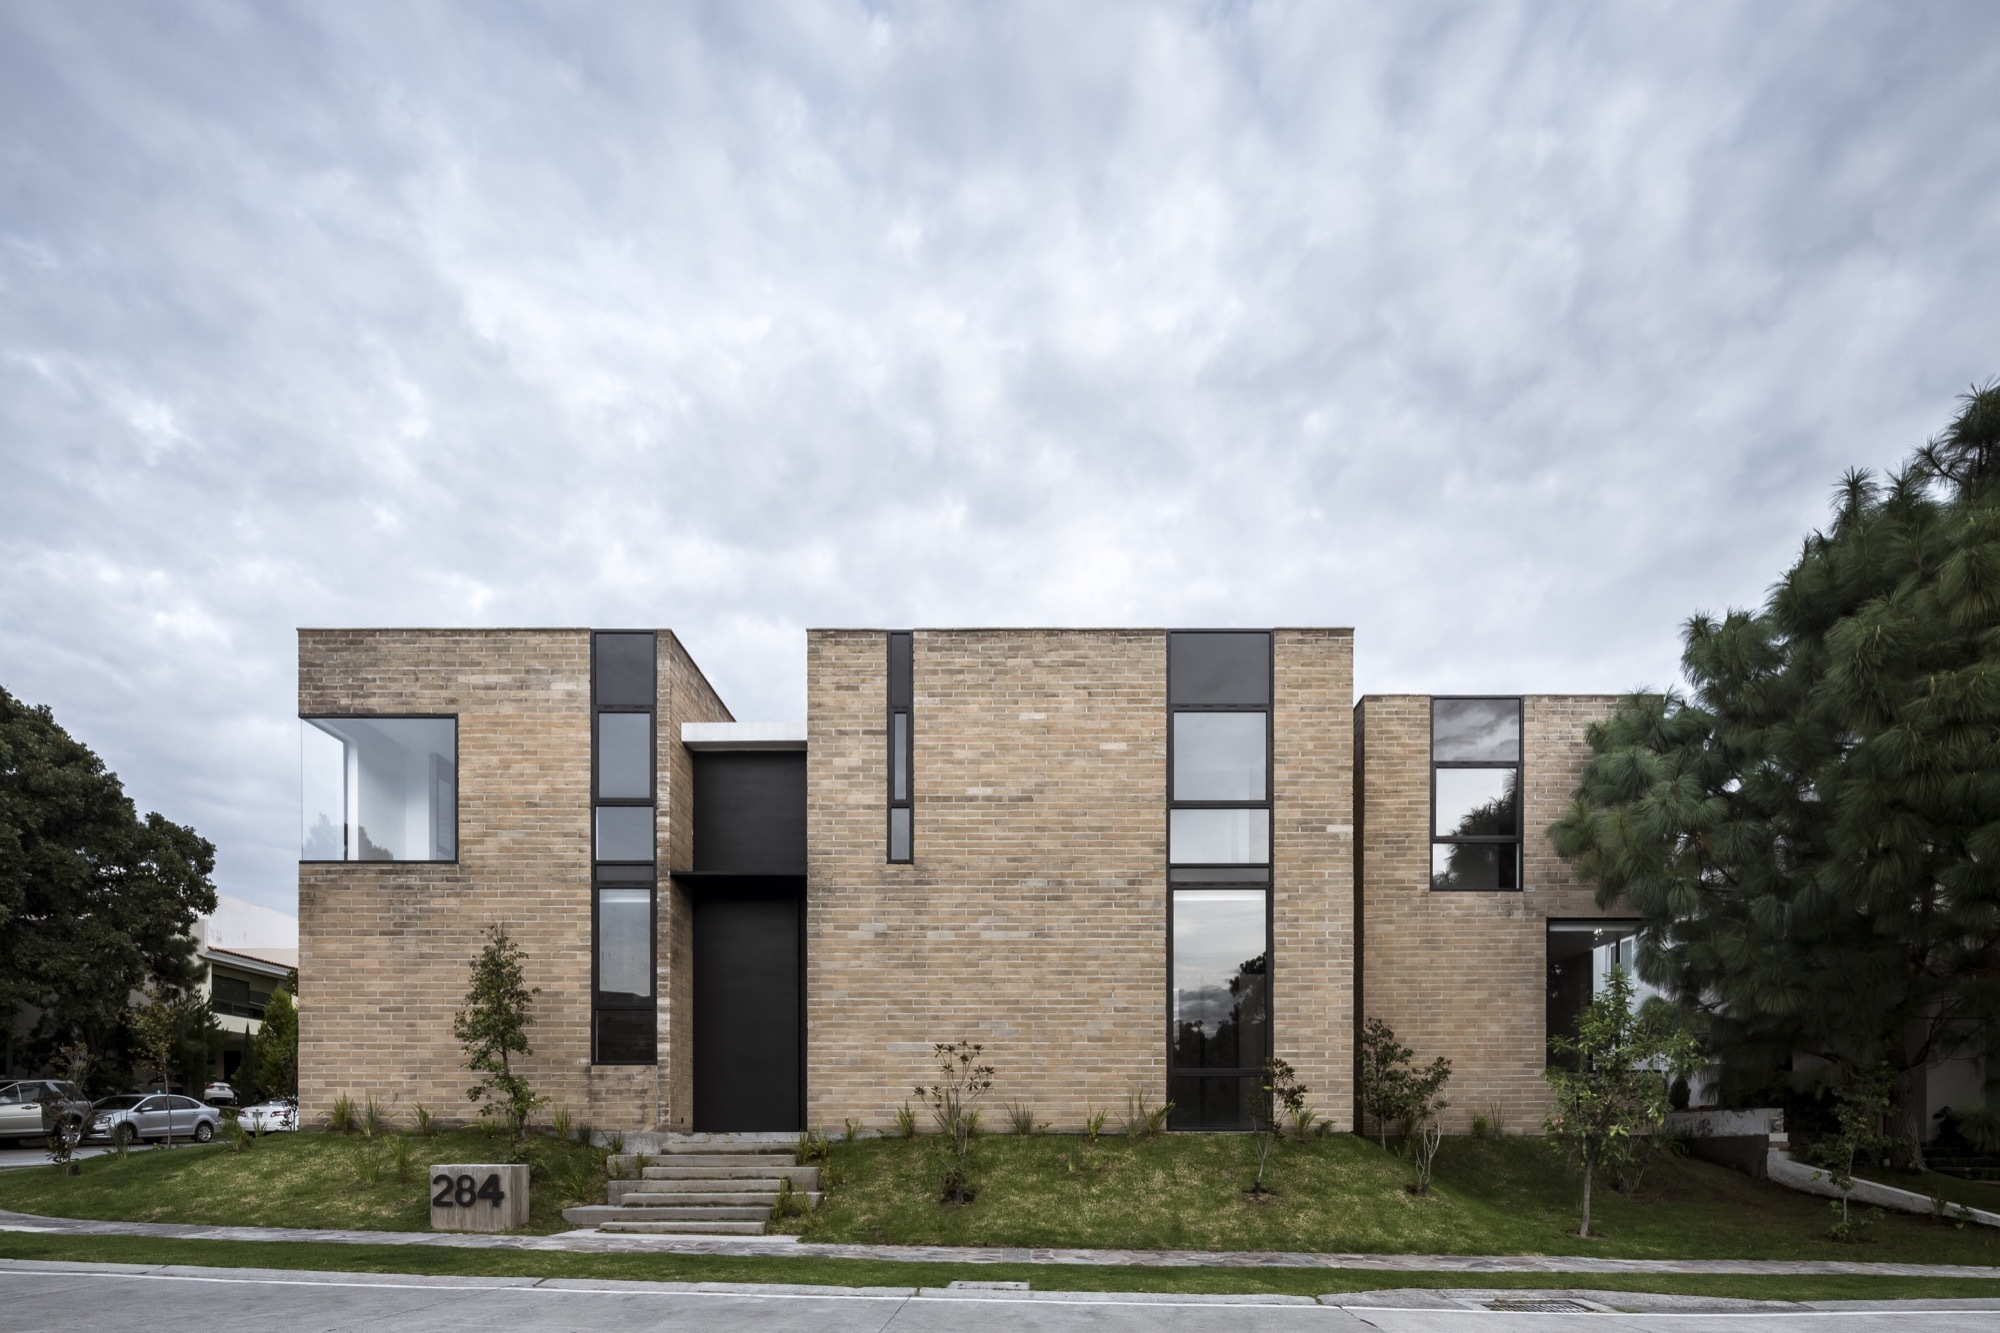 House El Cielo / Andrés Burguete